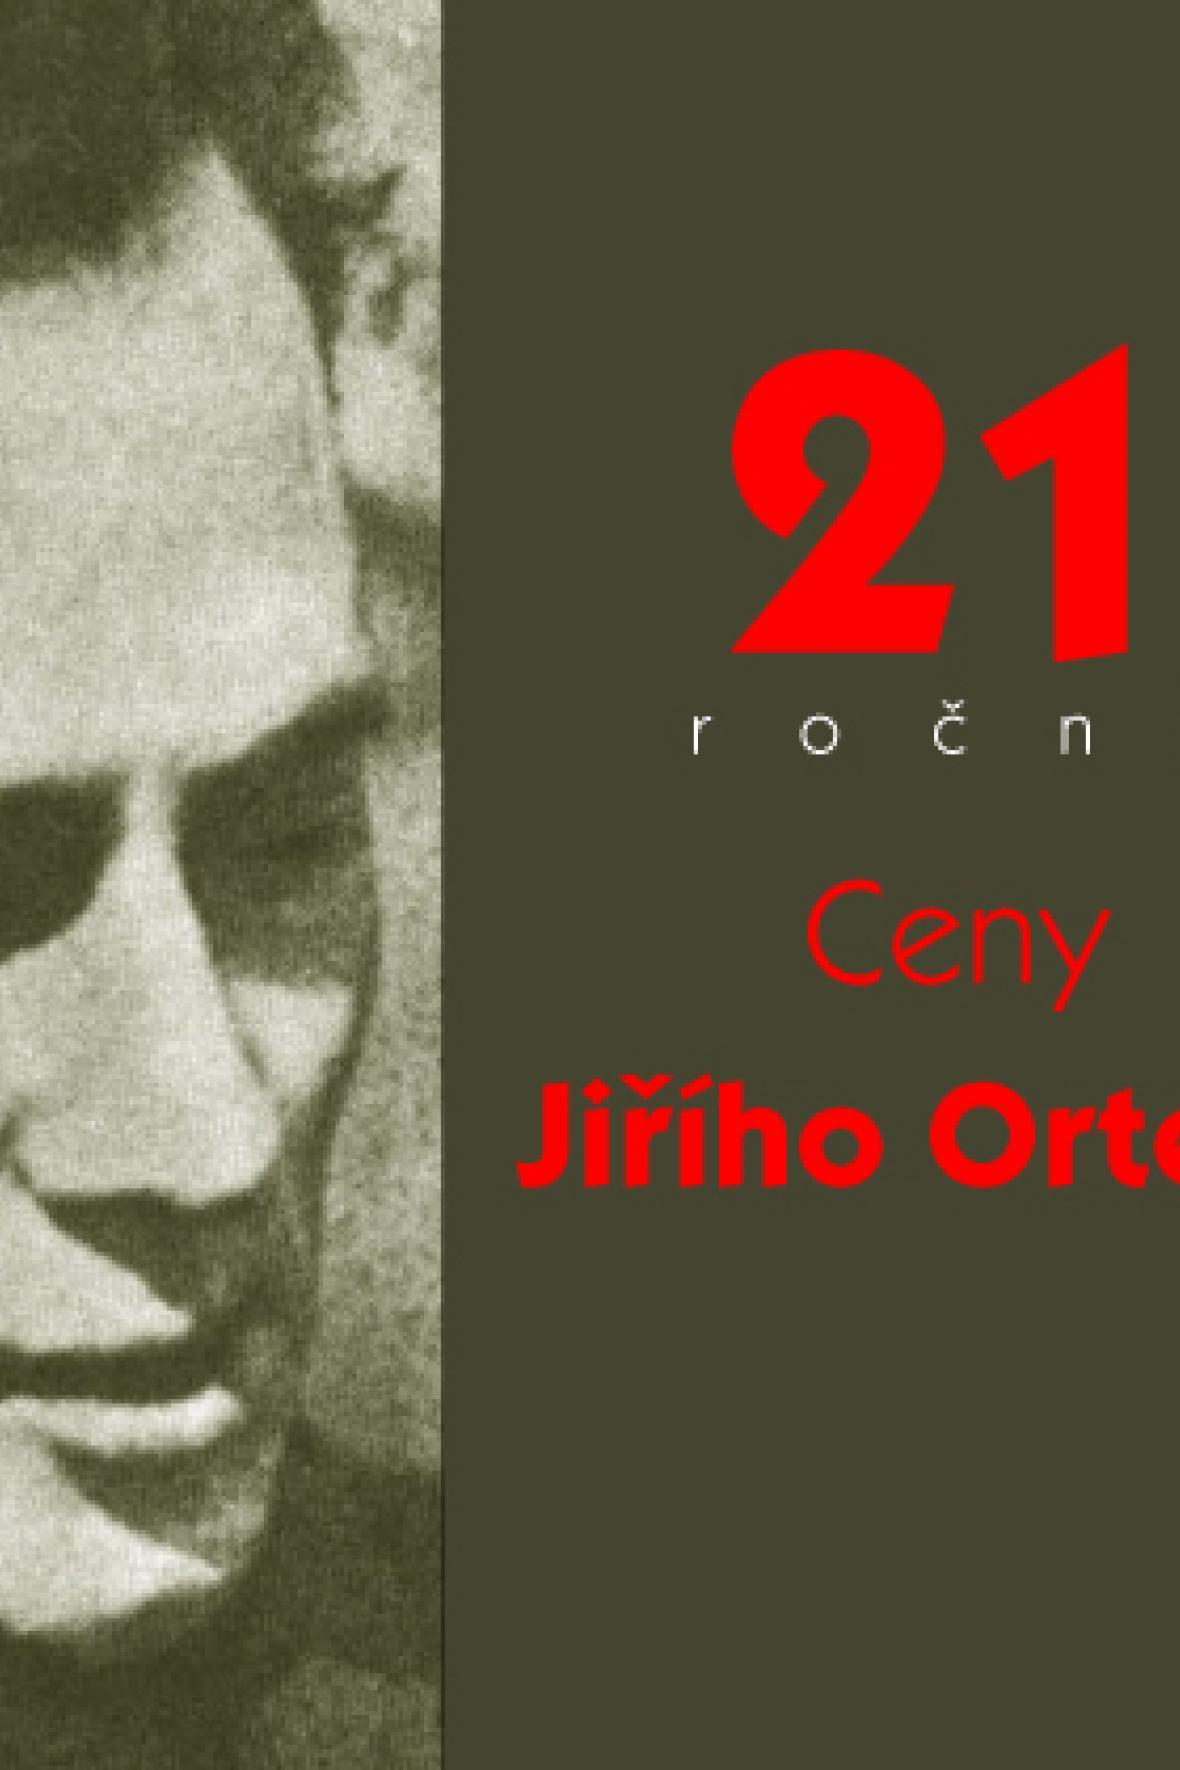 Cena Jiřího Ortena